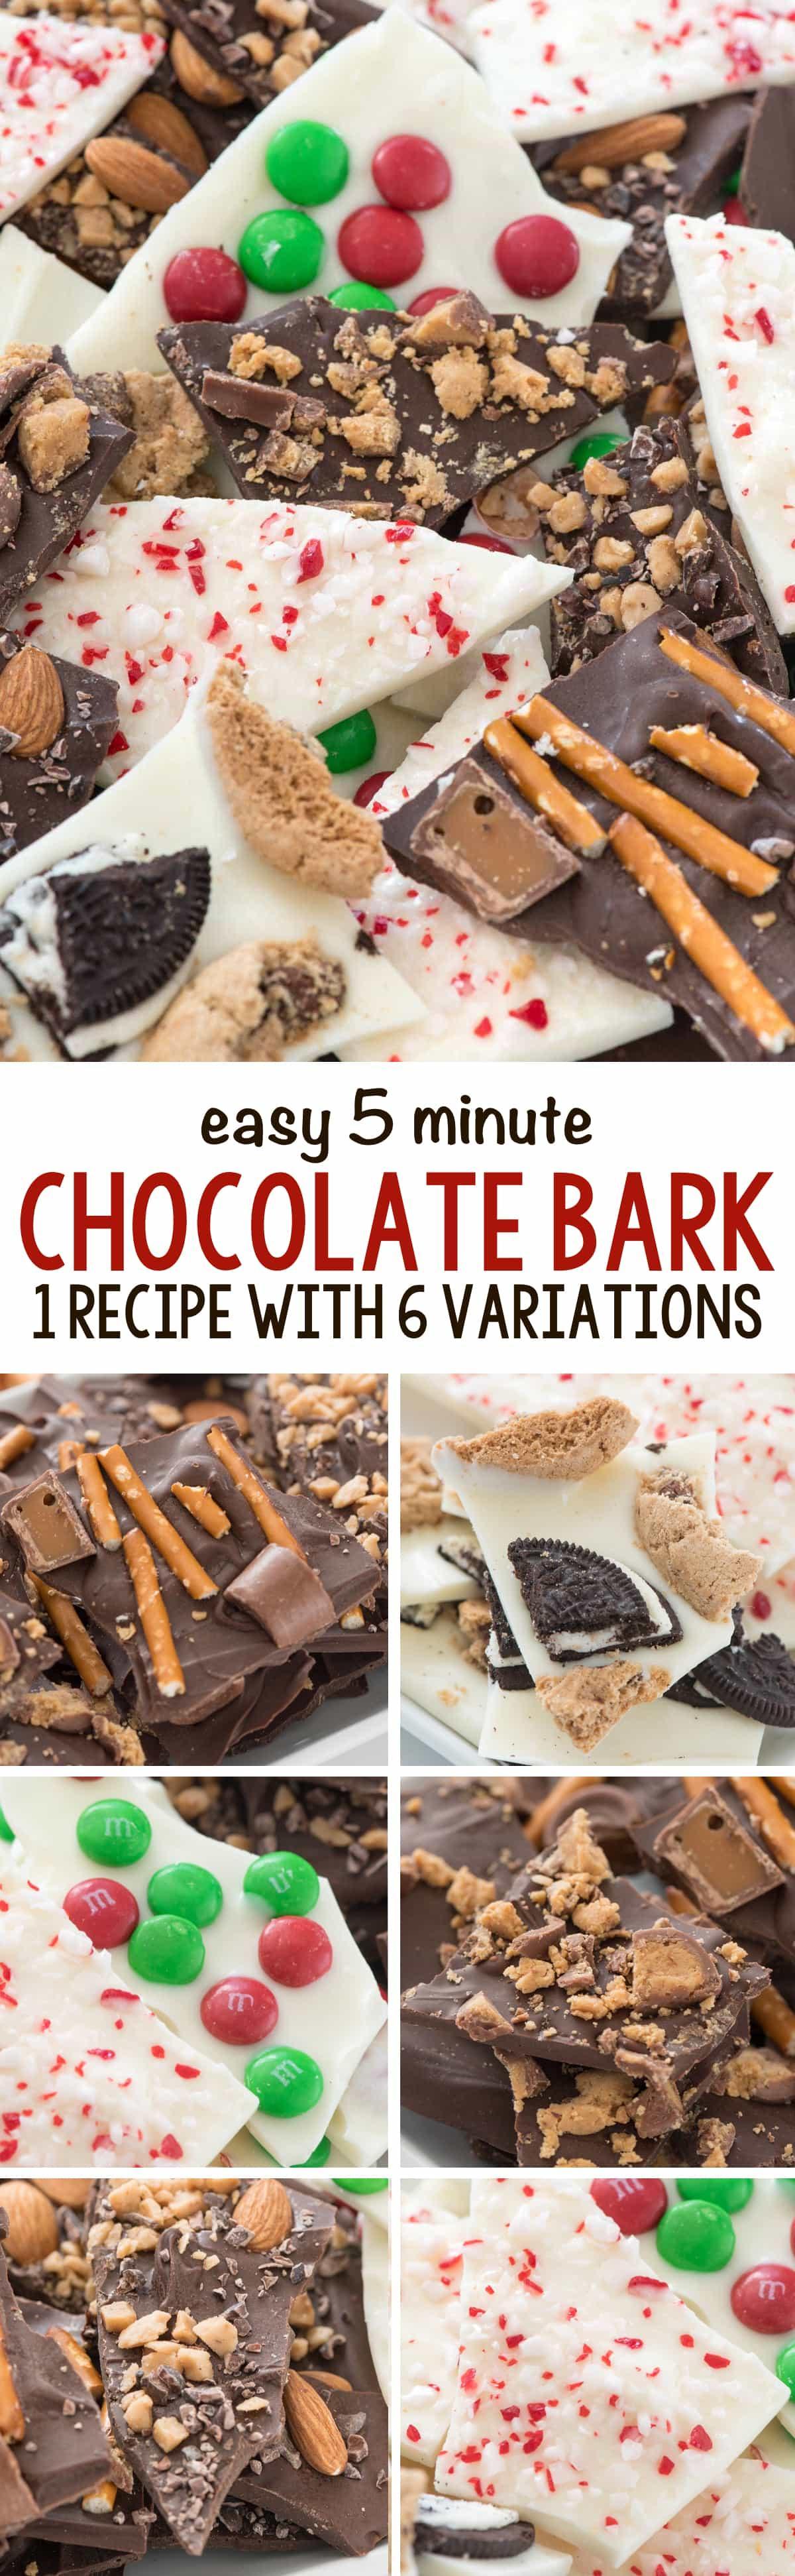 5 Minute Chocolate Bark Recipes